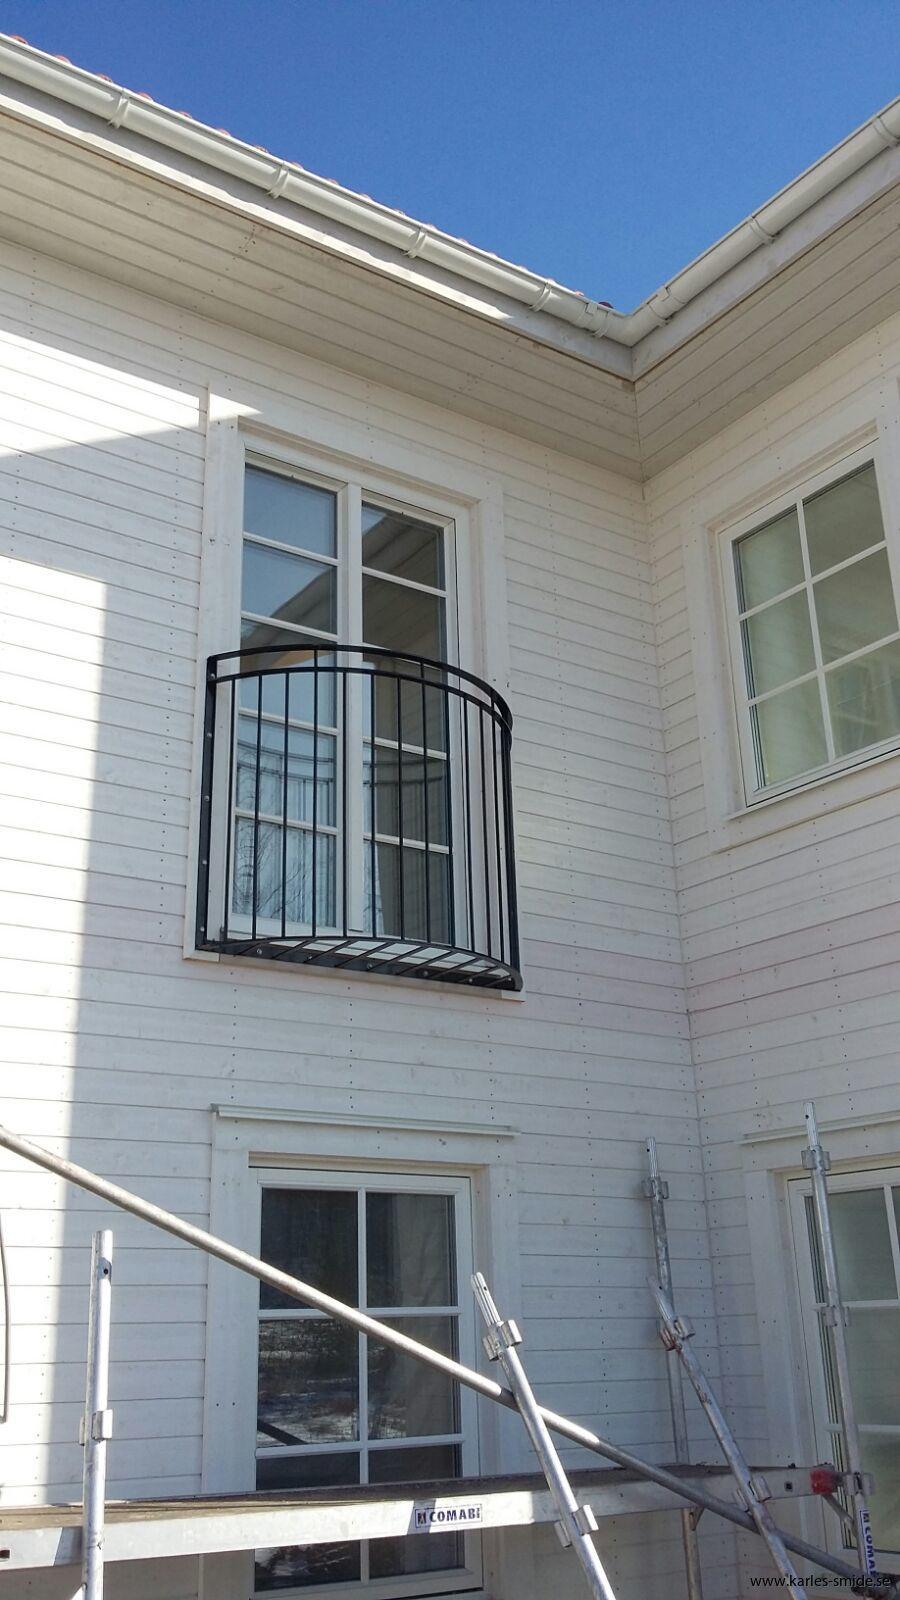 fransk balkong, räcke